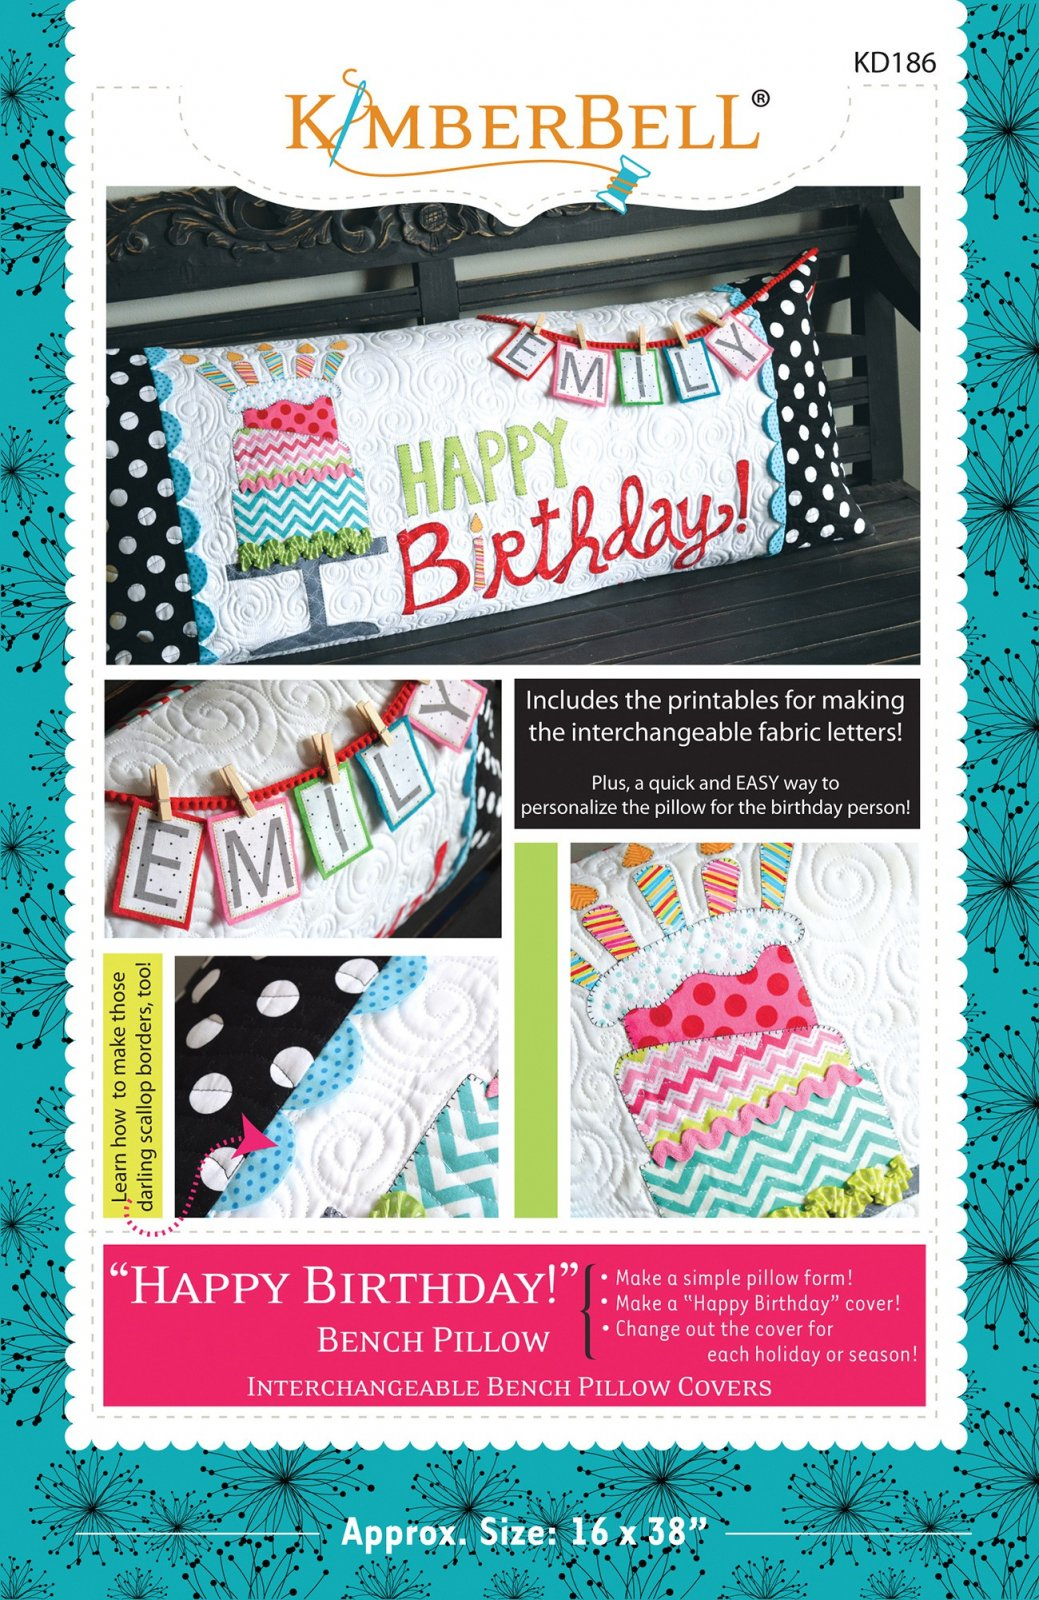 Happy Birthday! Bench Pillow